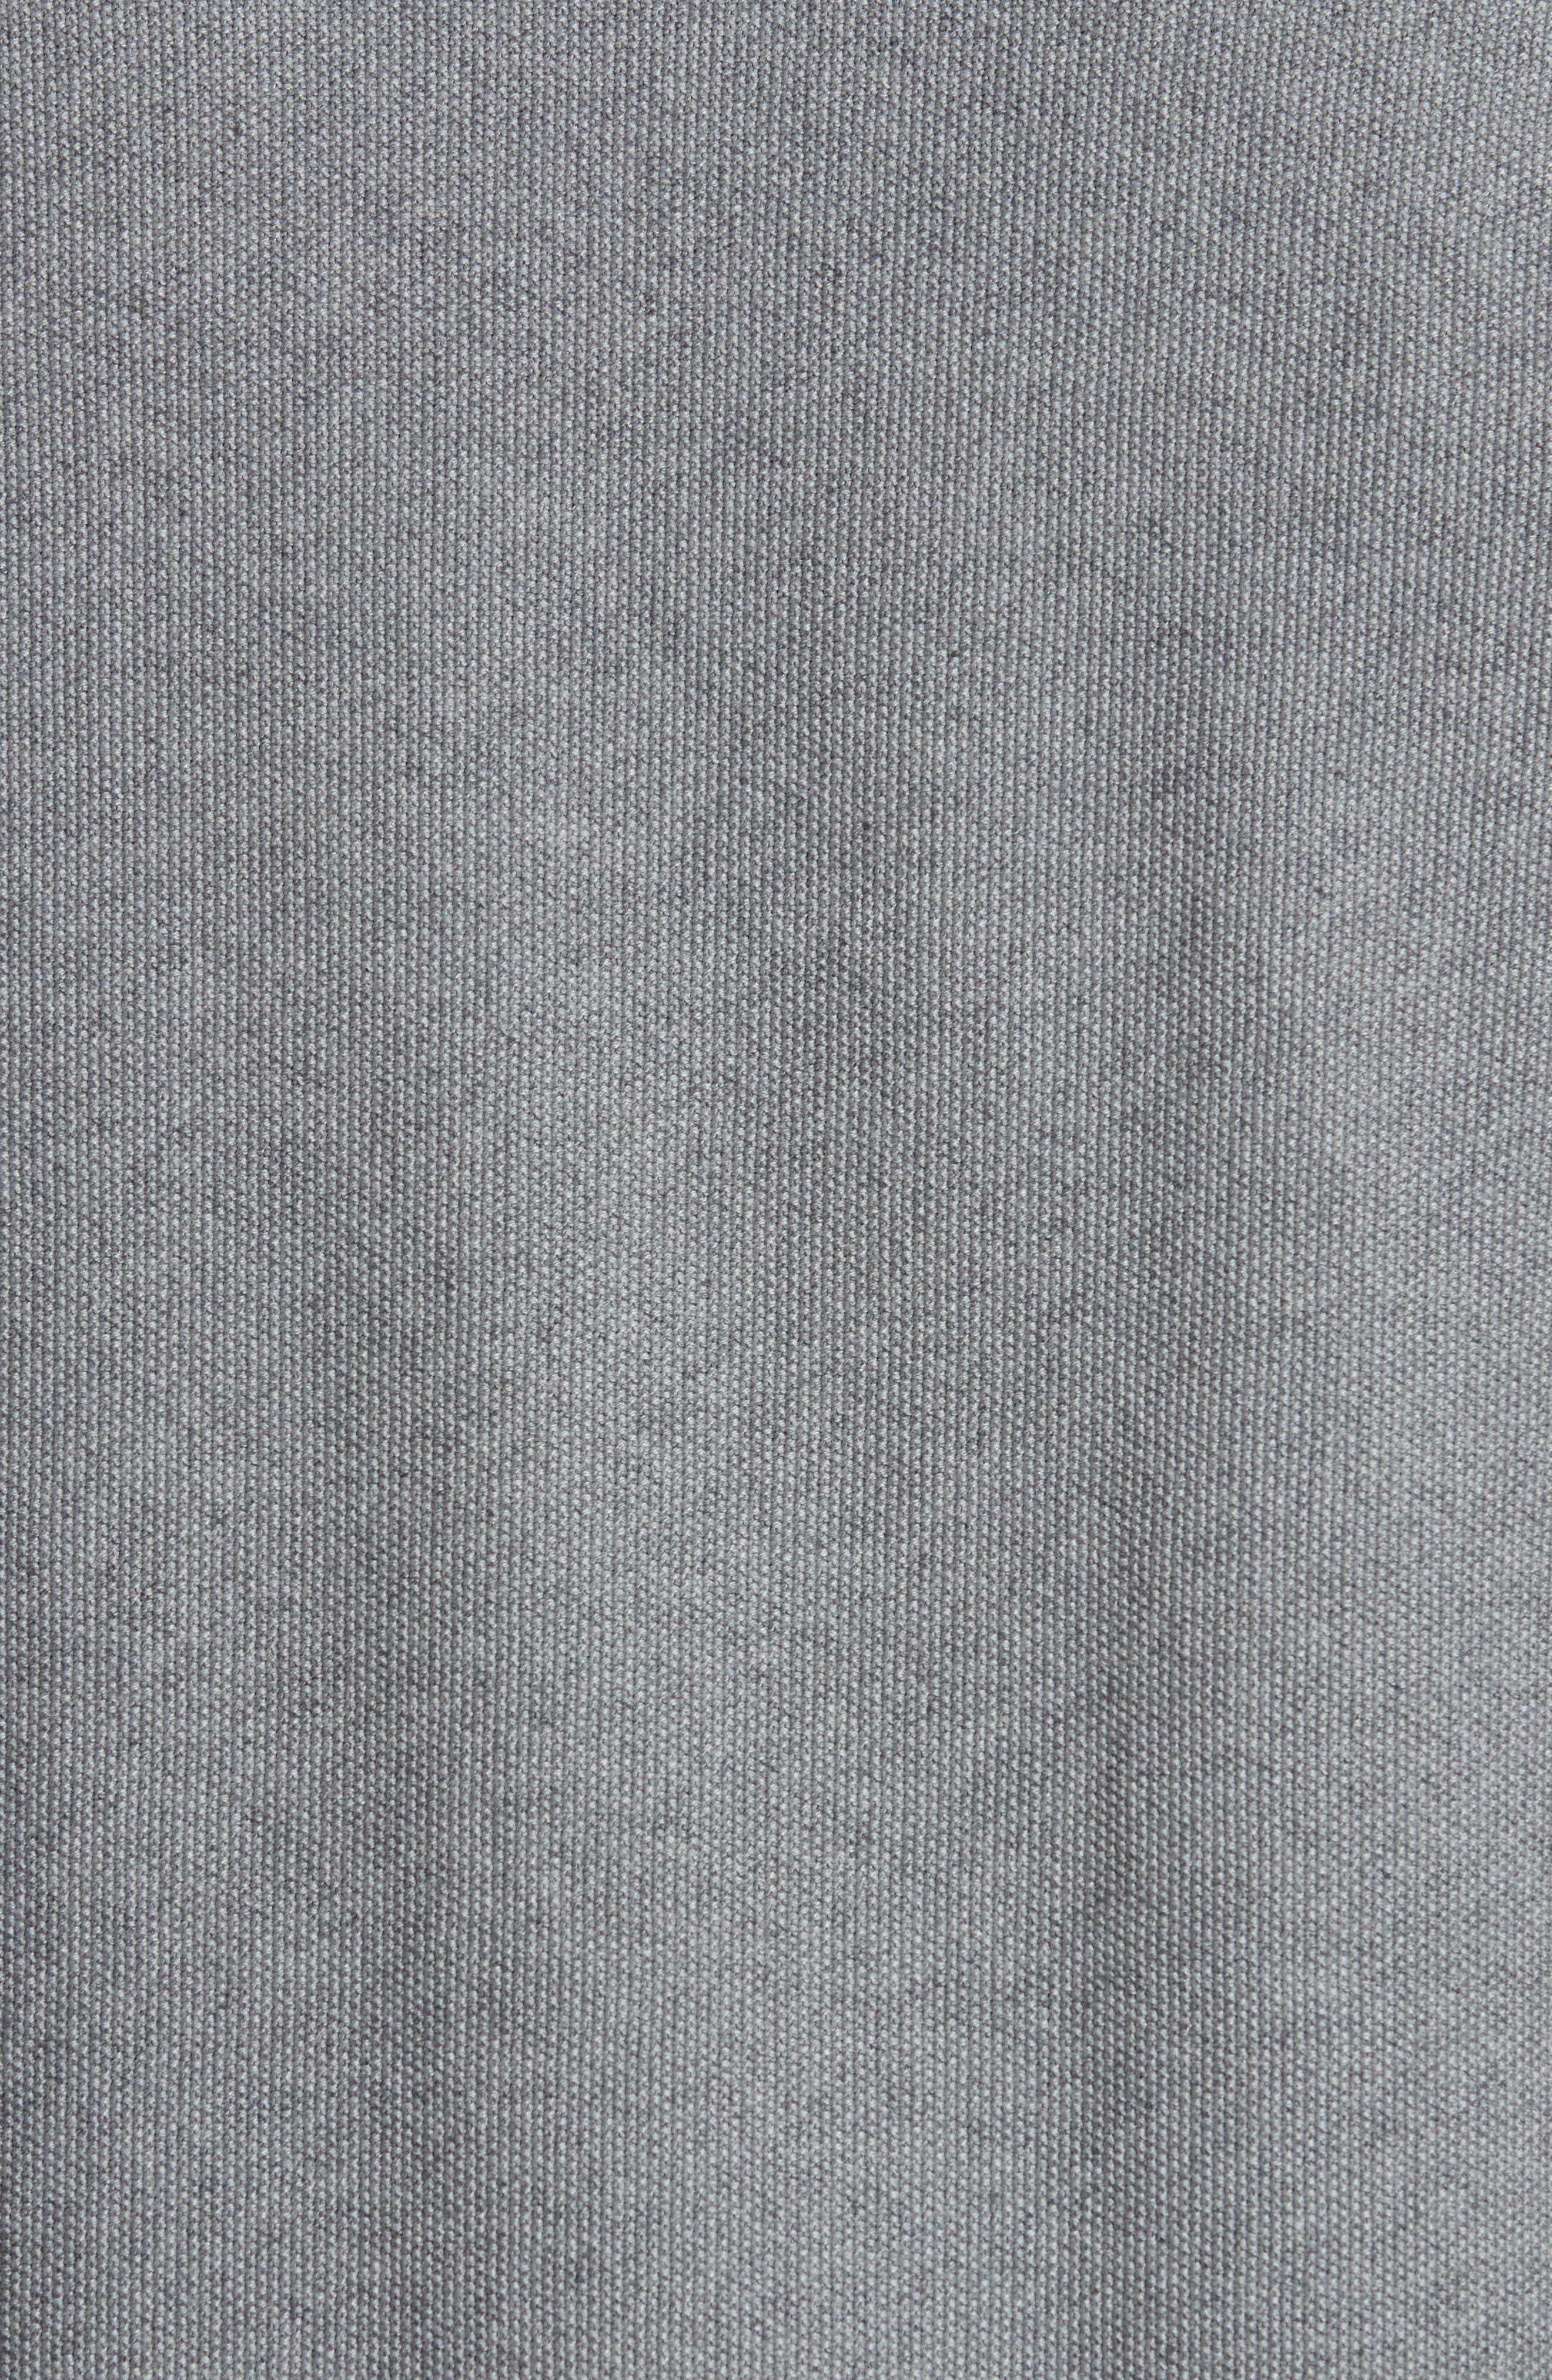 Cotton & Cashmere Sweater,                             Alternate thumbnail 5, color,                             Heather Grey